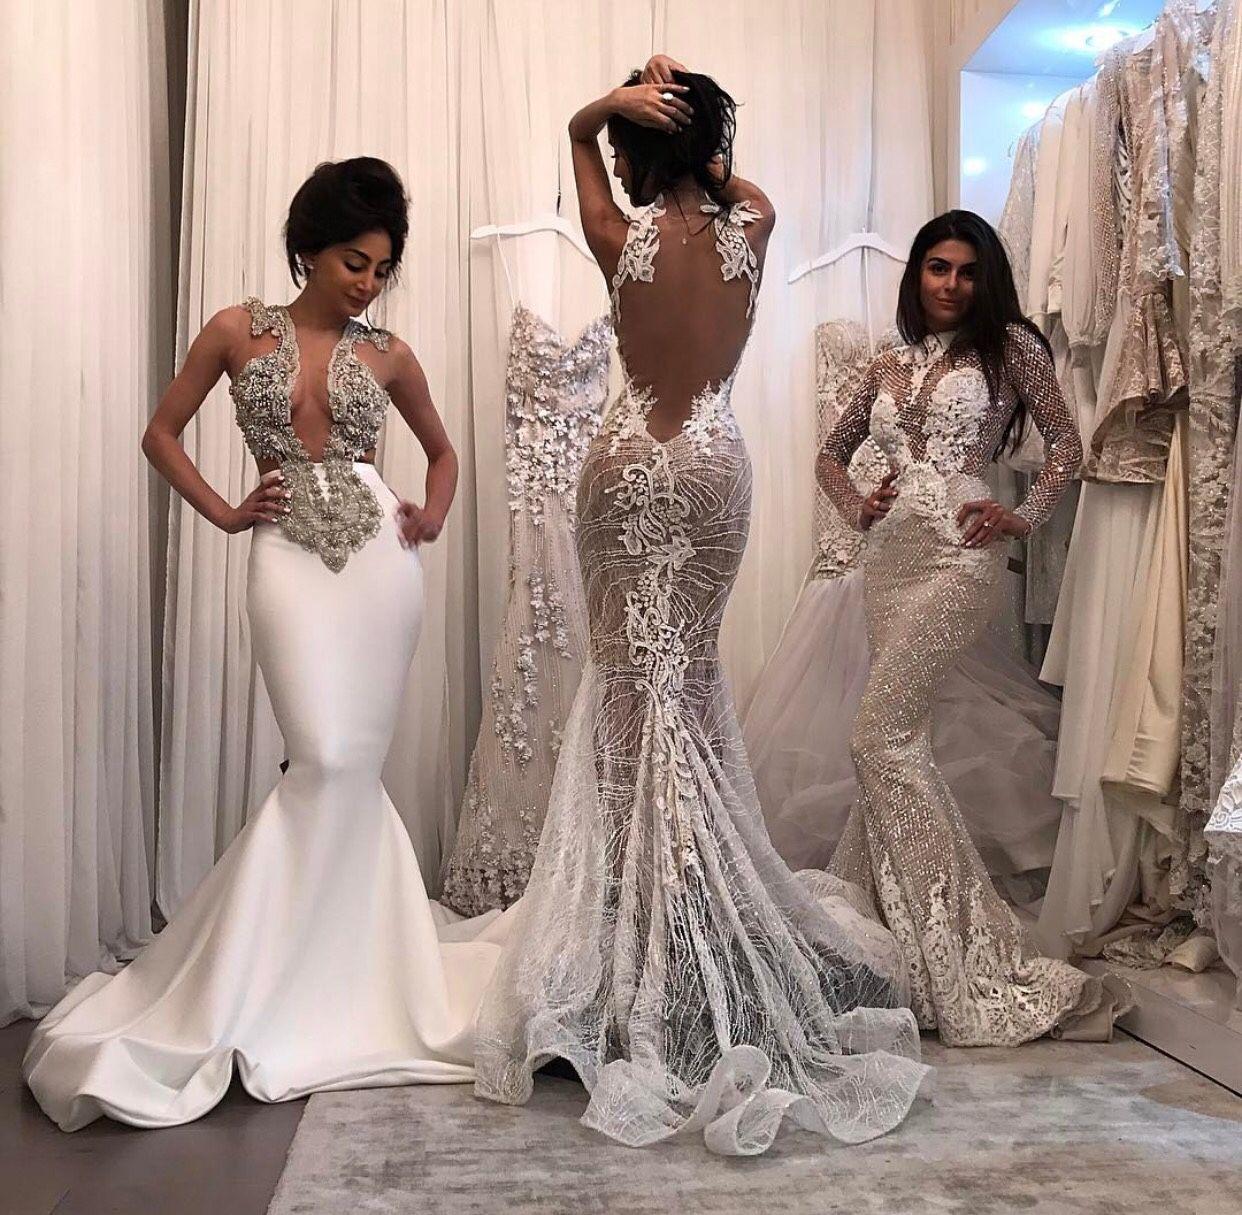 Follow brnzedbeauty for more luxury ig sharonemel wedding